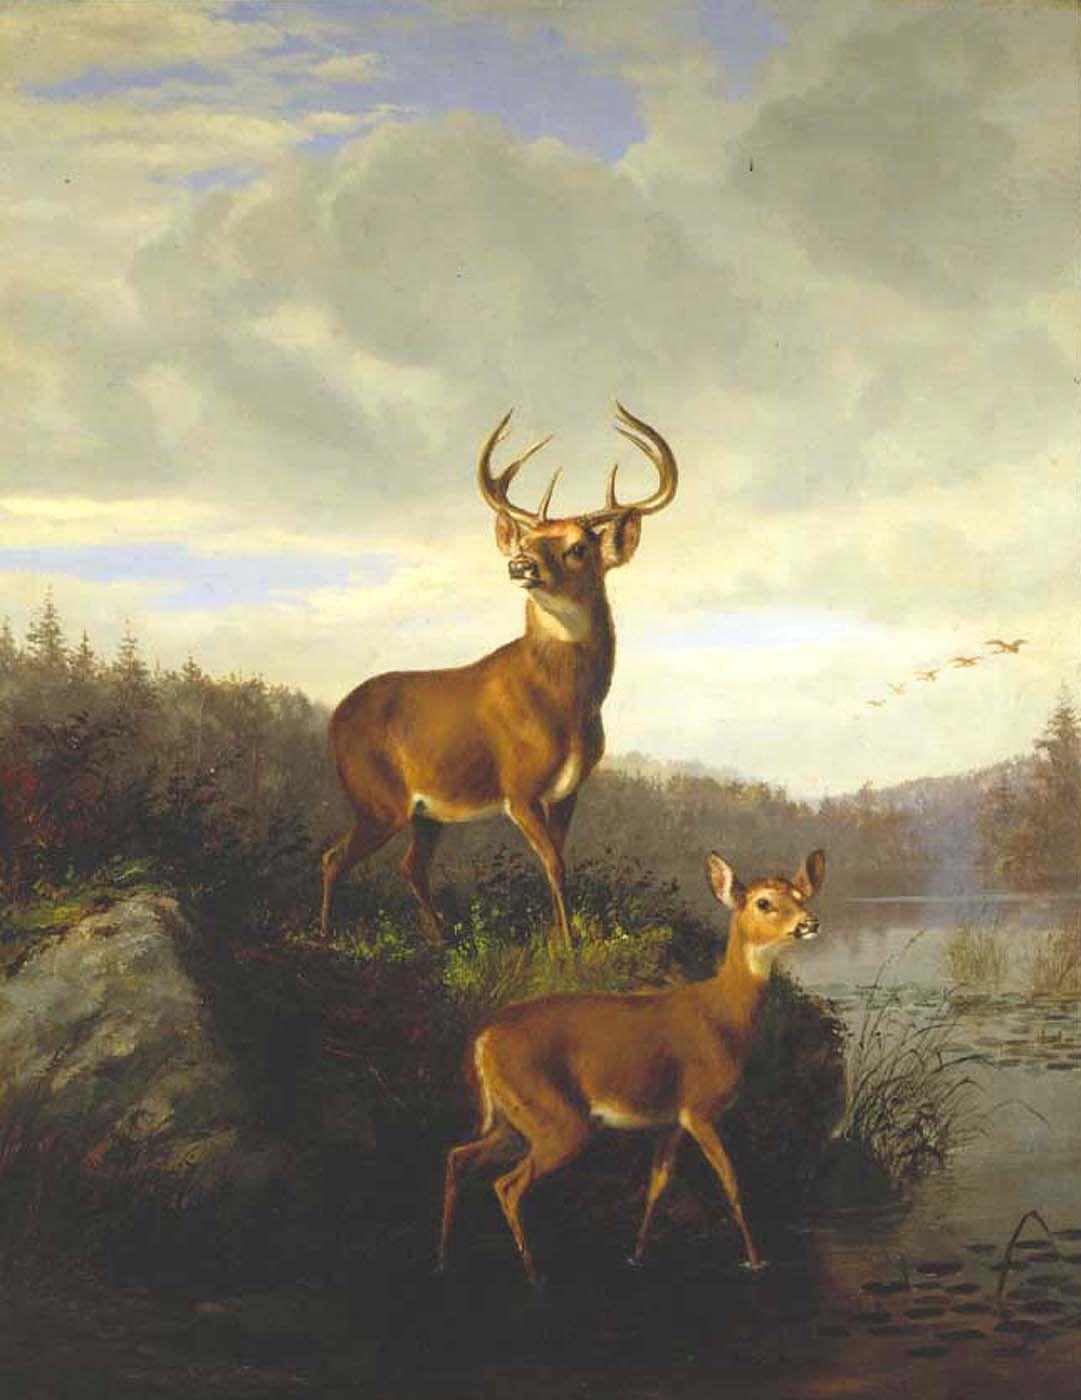 Arthur Fitzwilliam Tait (1819-1905), Buck and Doe, 1878